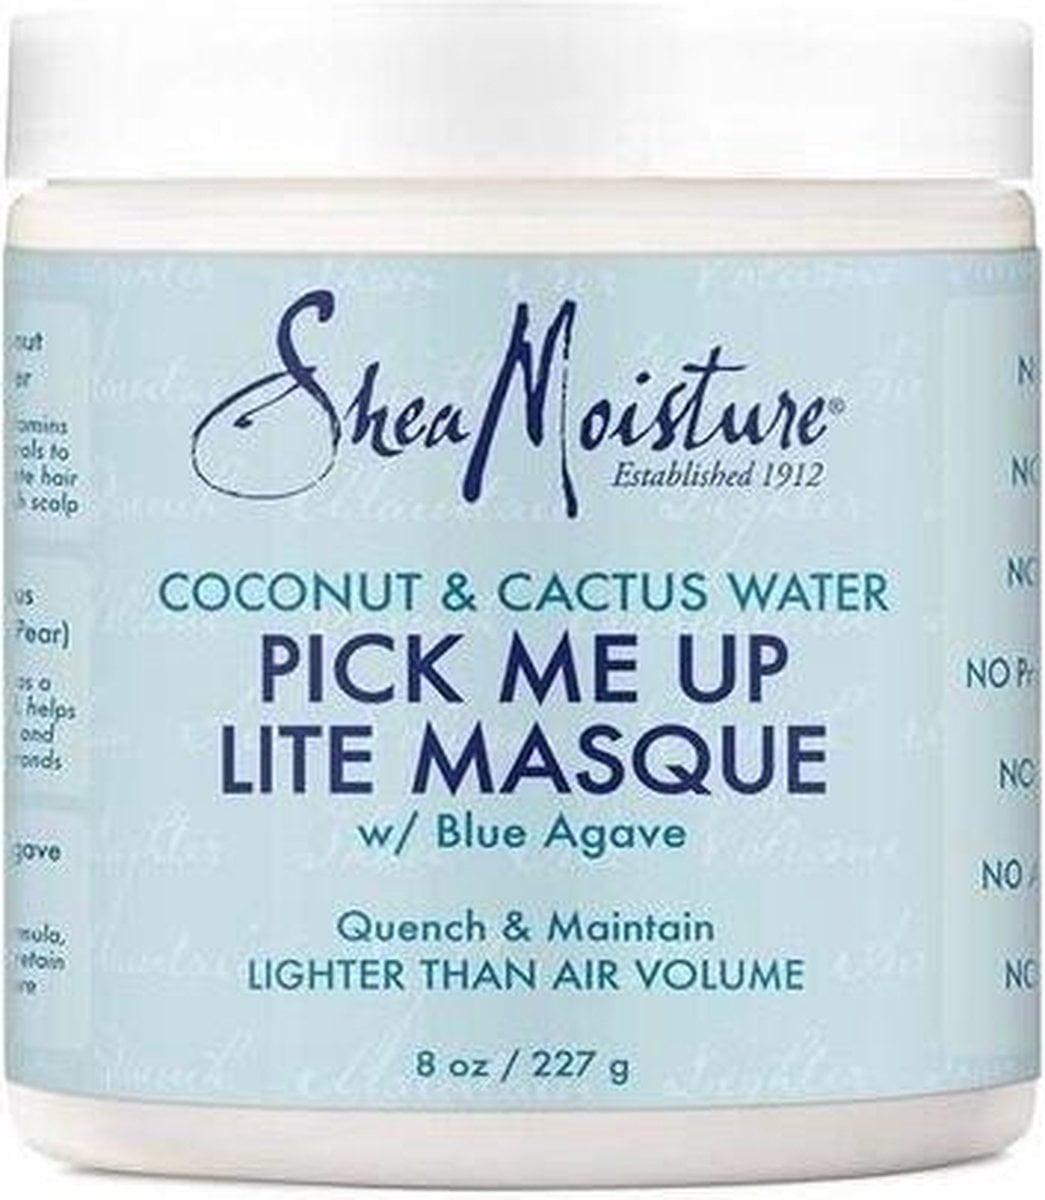 Shea Moisture Coconut & Cactus Water Pick Me Up Lite Masque 227gr